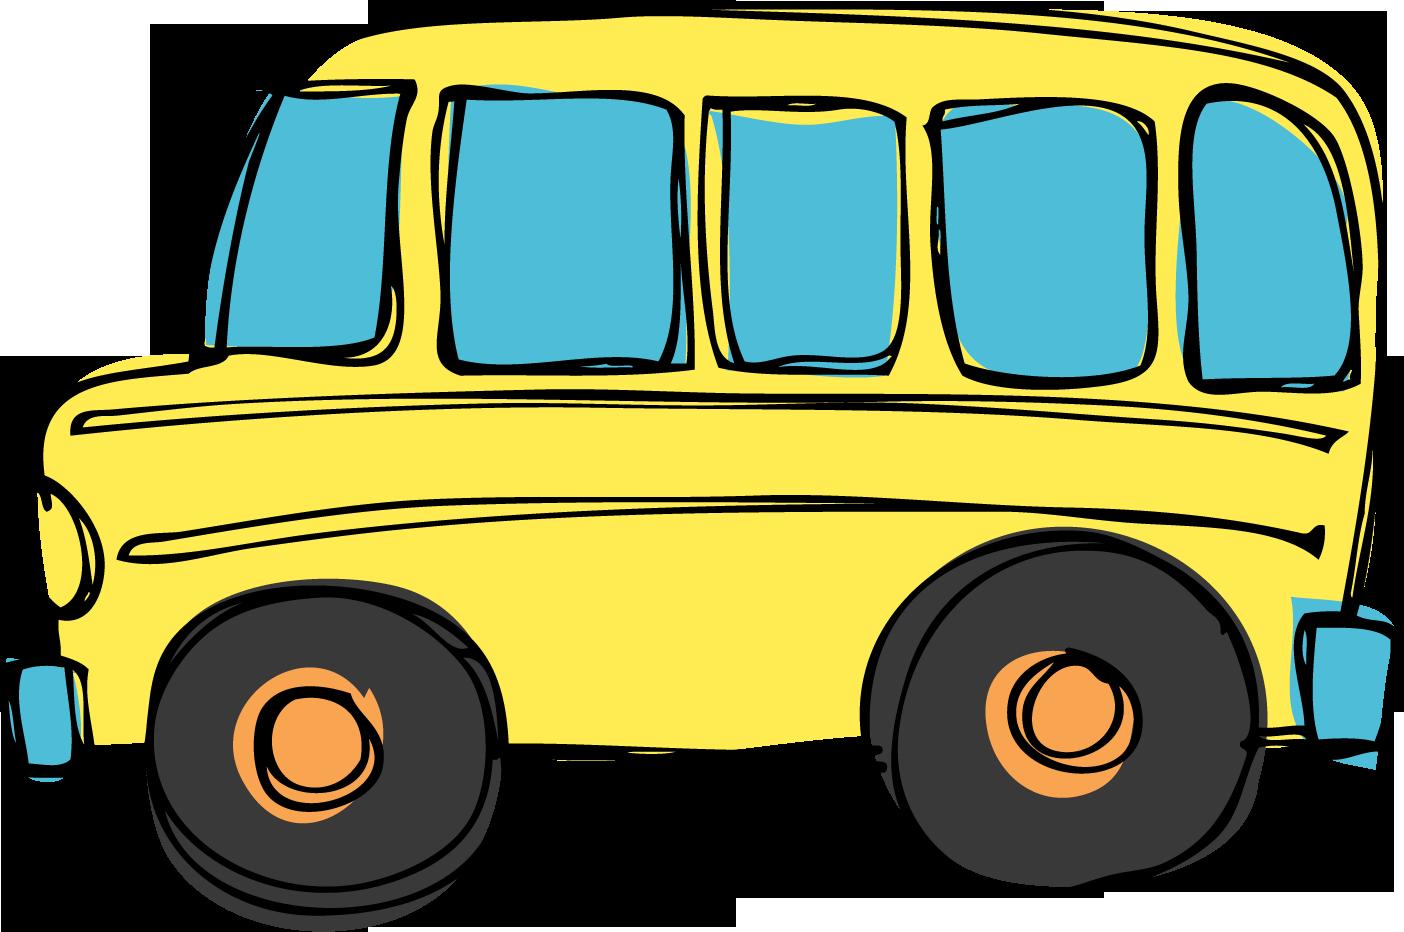 yellow bus clipart - photo #10